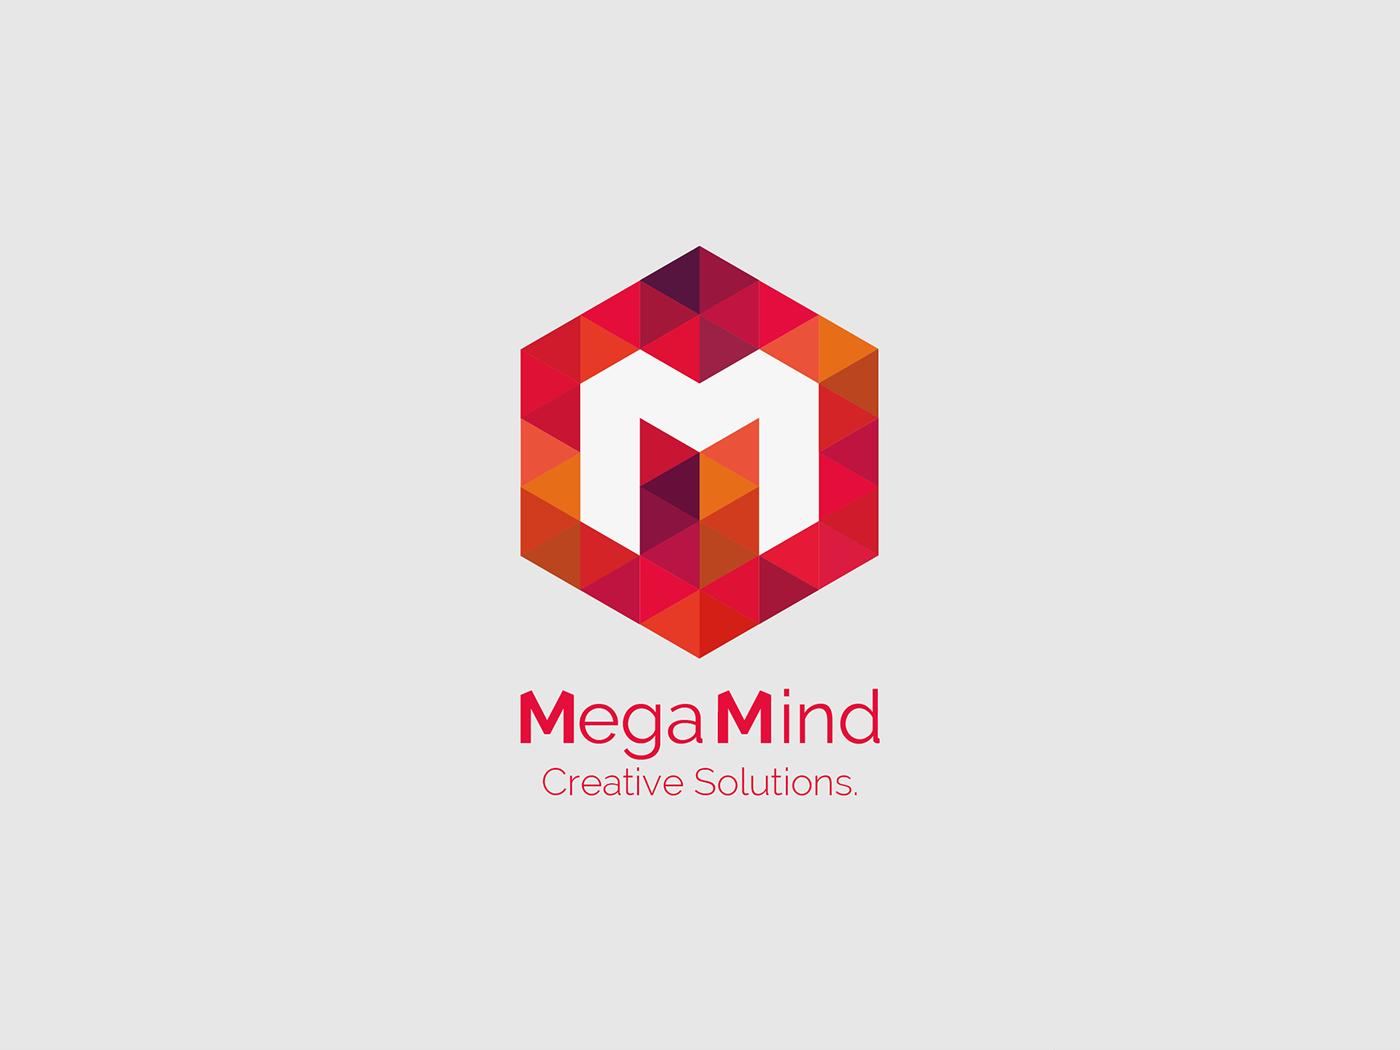 Megamind Logo And Branding On Behance